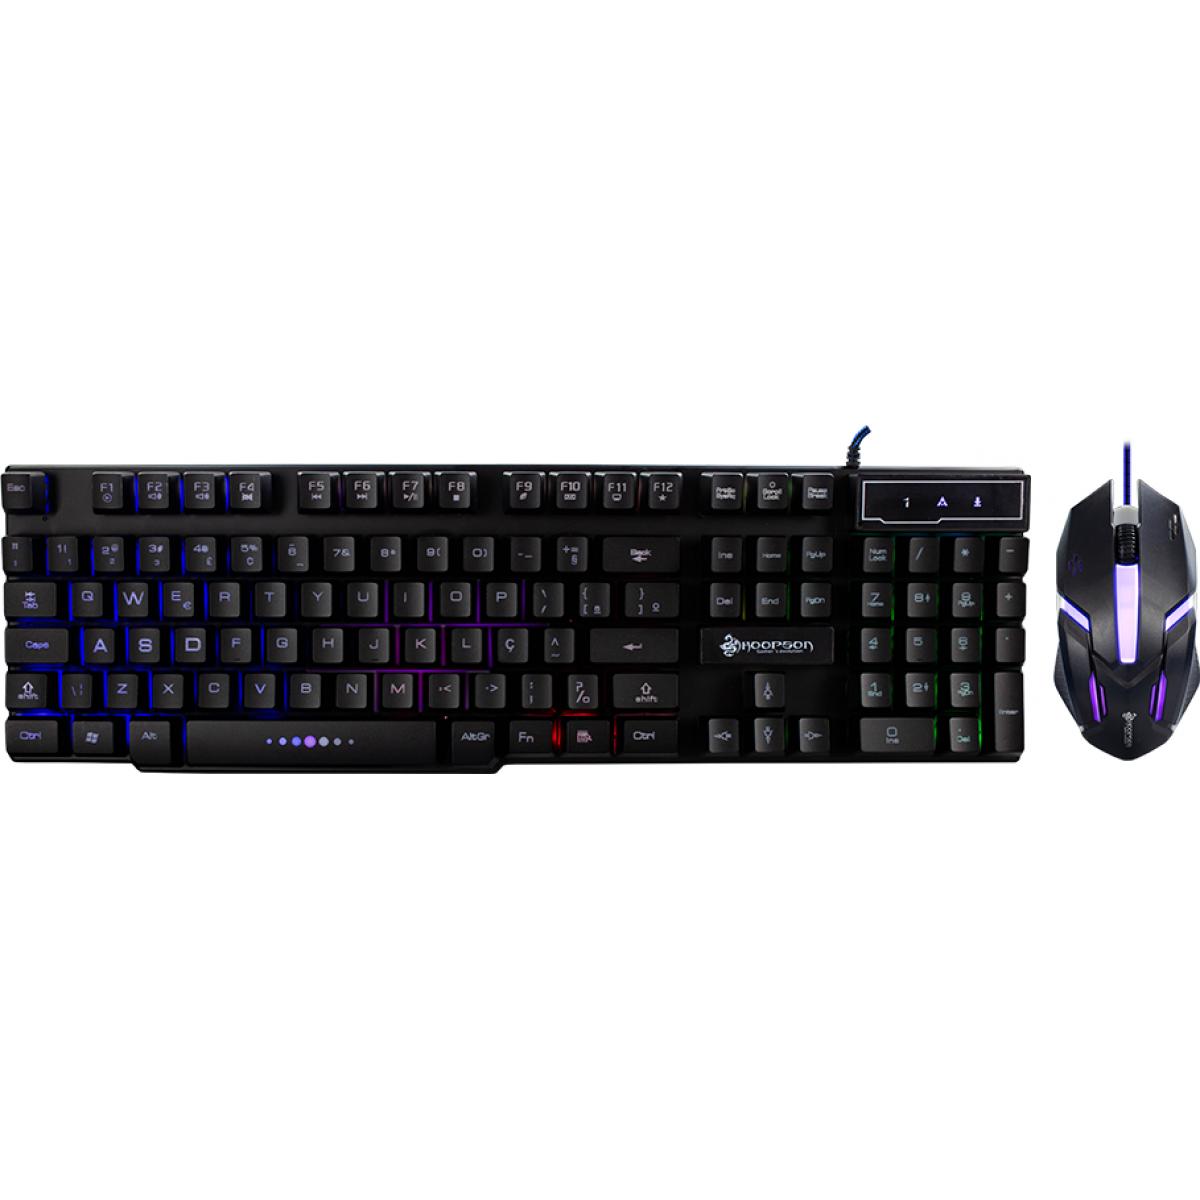 Combo Gamer Hoopson, Teclado, Mouse, Black, TPC-053K